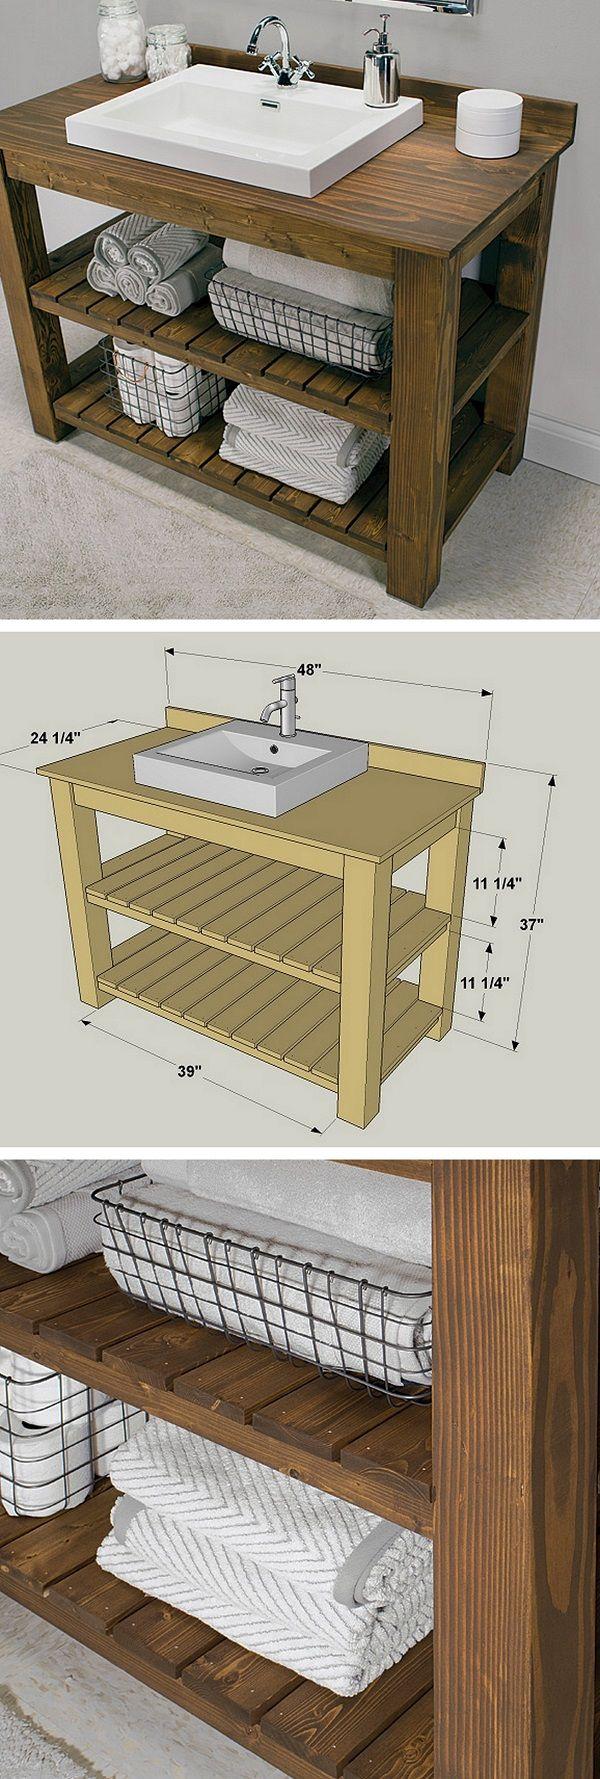 Design Collection Marvelous Bathroom Vanity Cabinet Ideas 50 New Inspiration